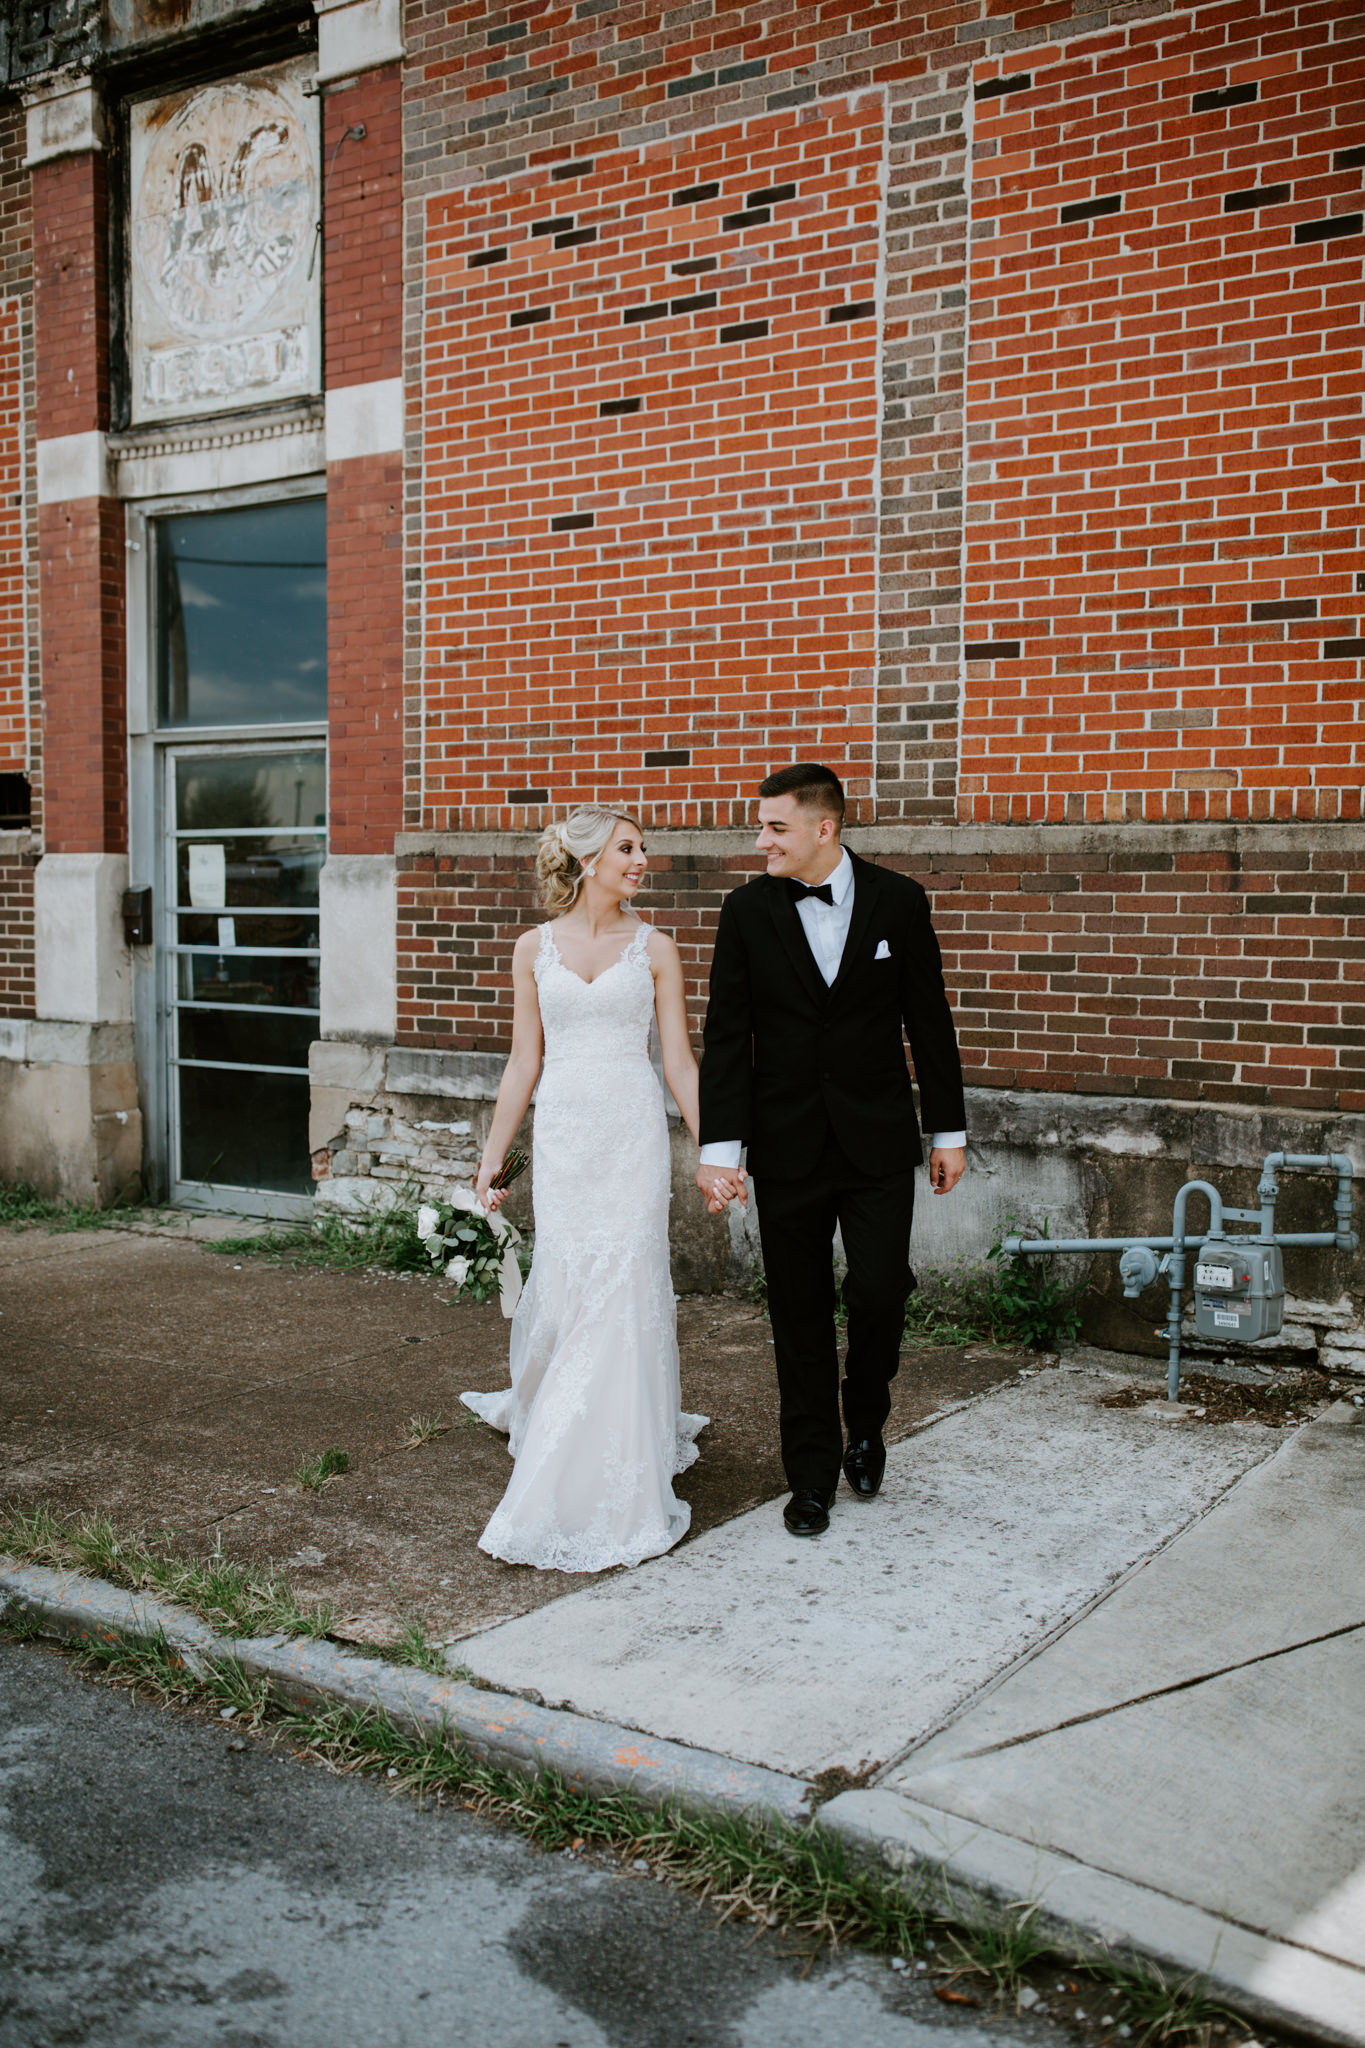 Kayley + Robert + Chattanooga + Nashville + Tennessee + Wedding-2-2.jpg